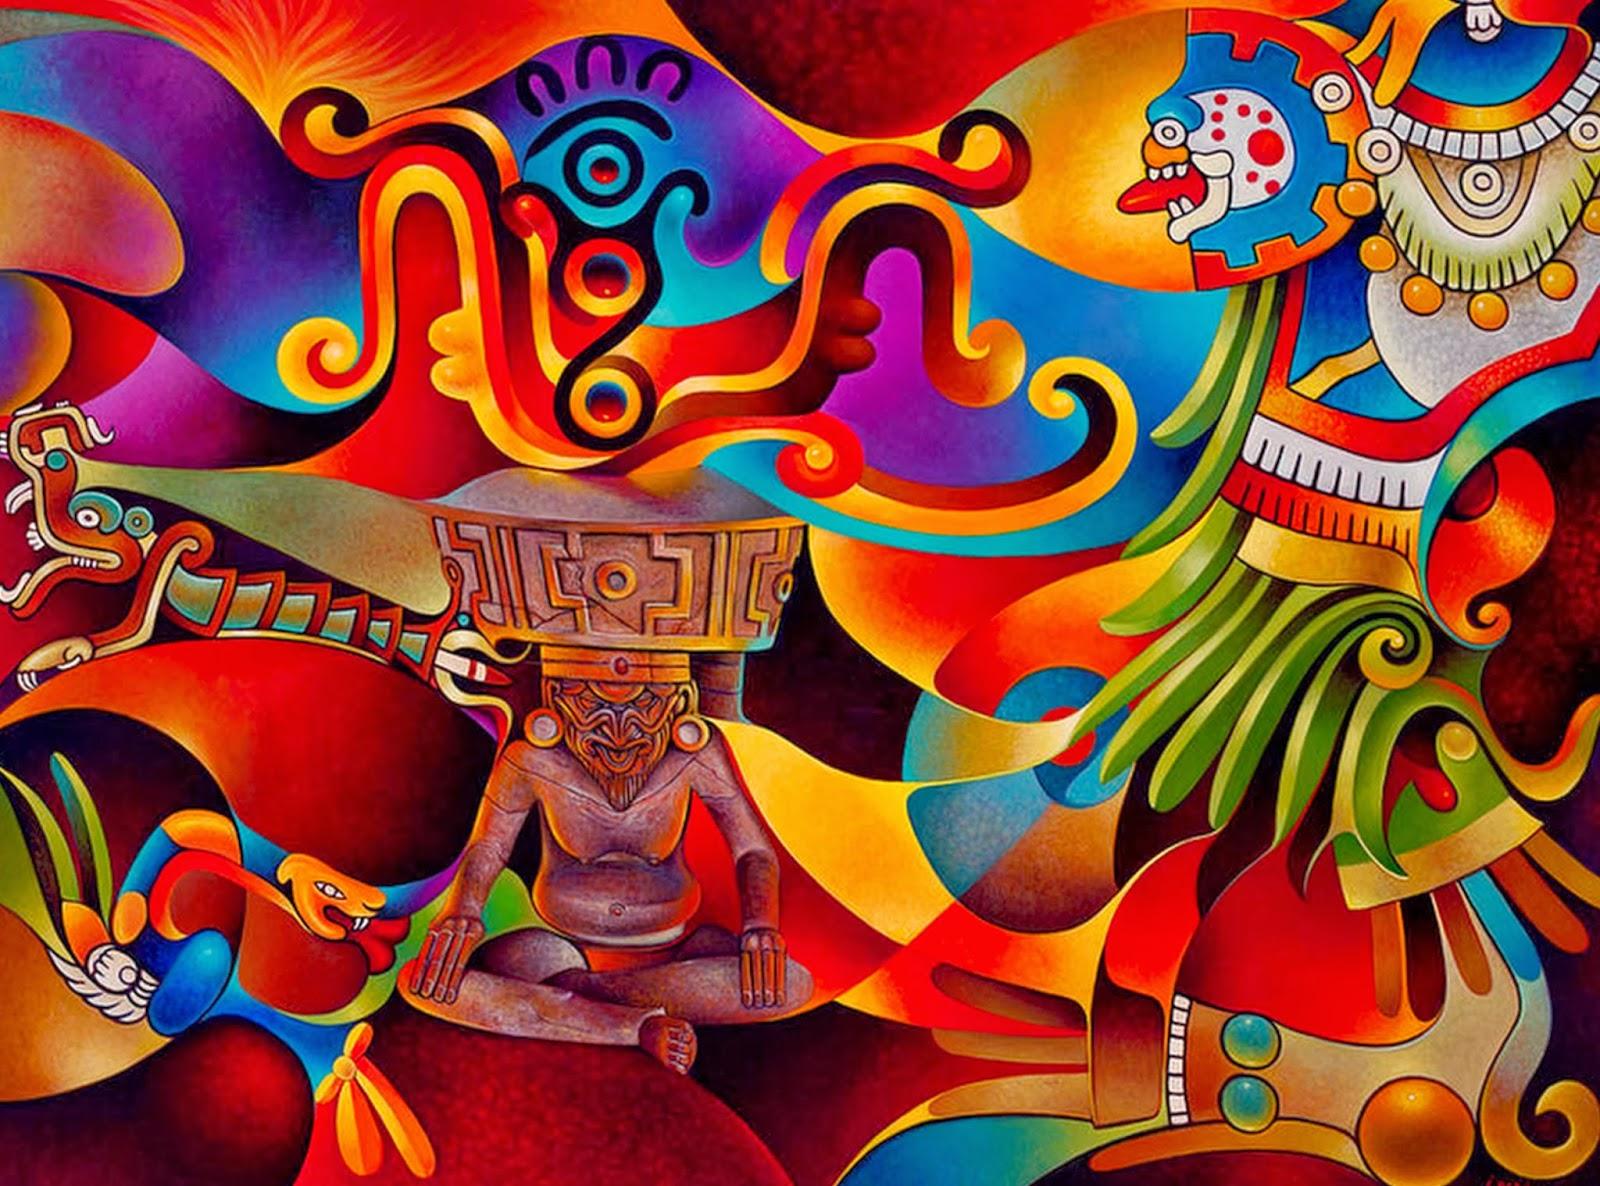 Im genes arte pinturas pinturas modernas al leo ricardo - Pinturas de pared modernas ...